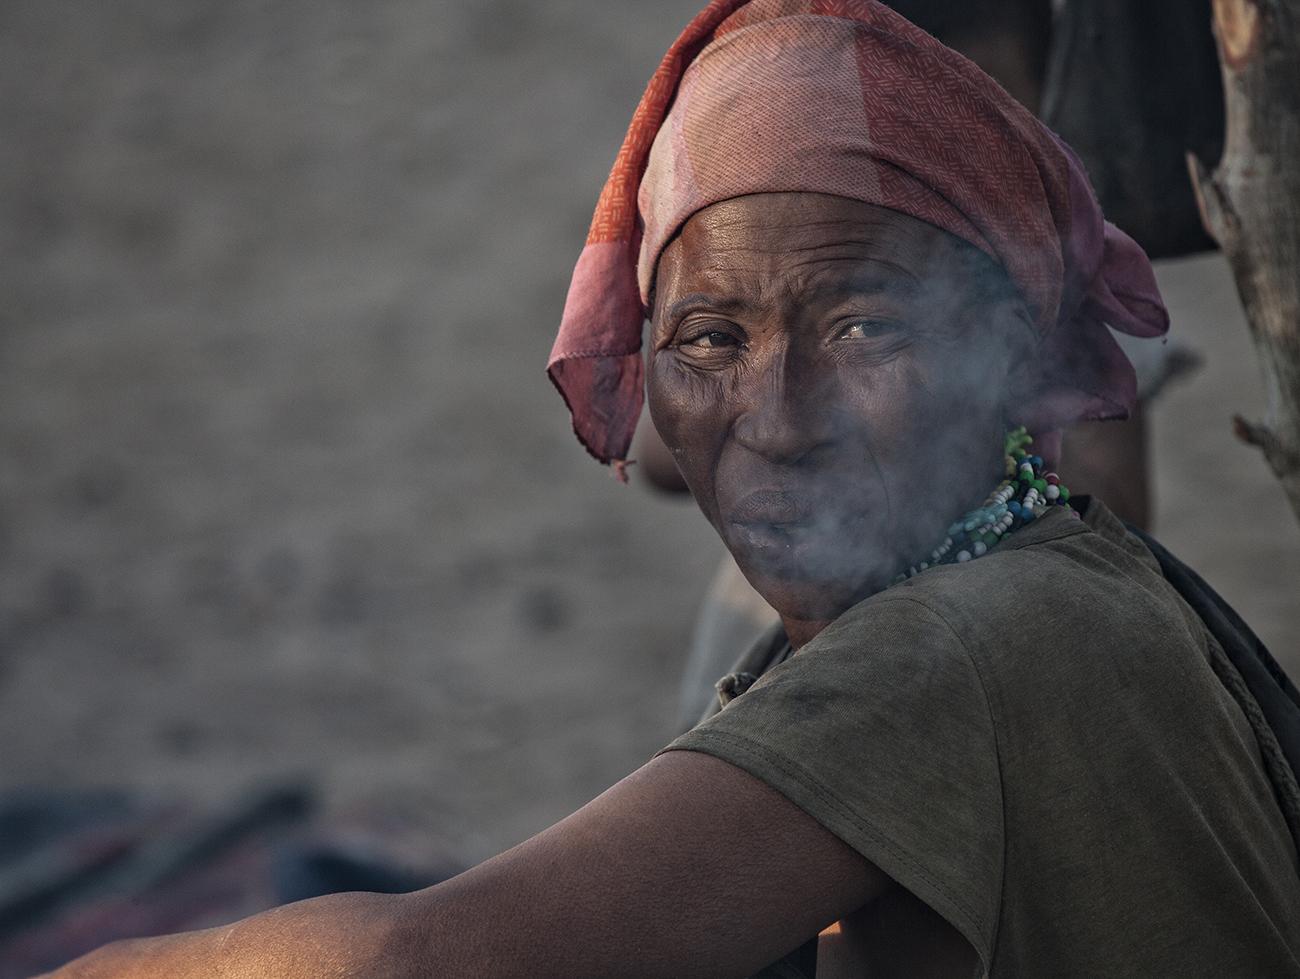 Fumadora Bushman